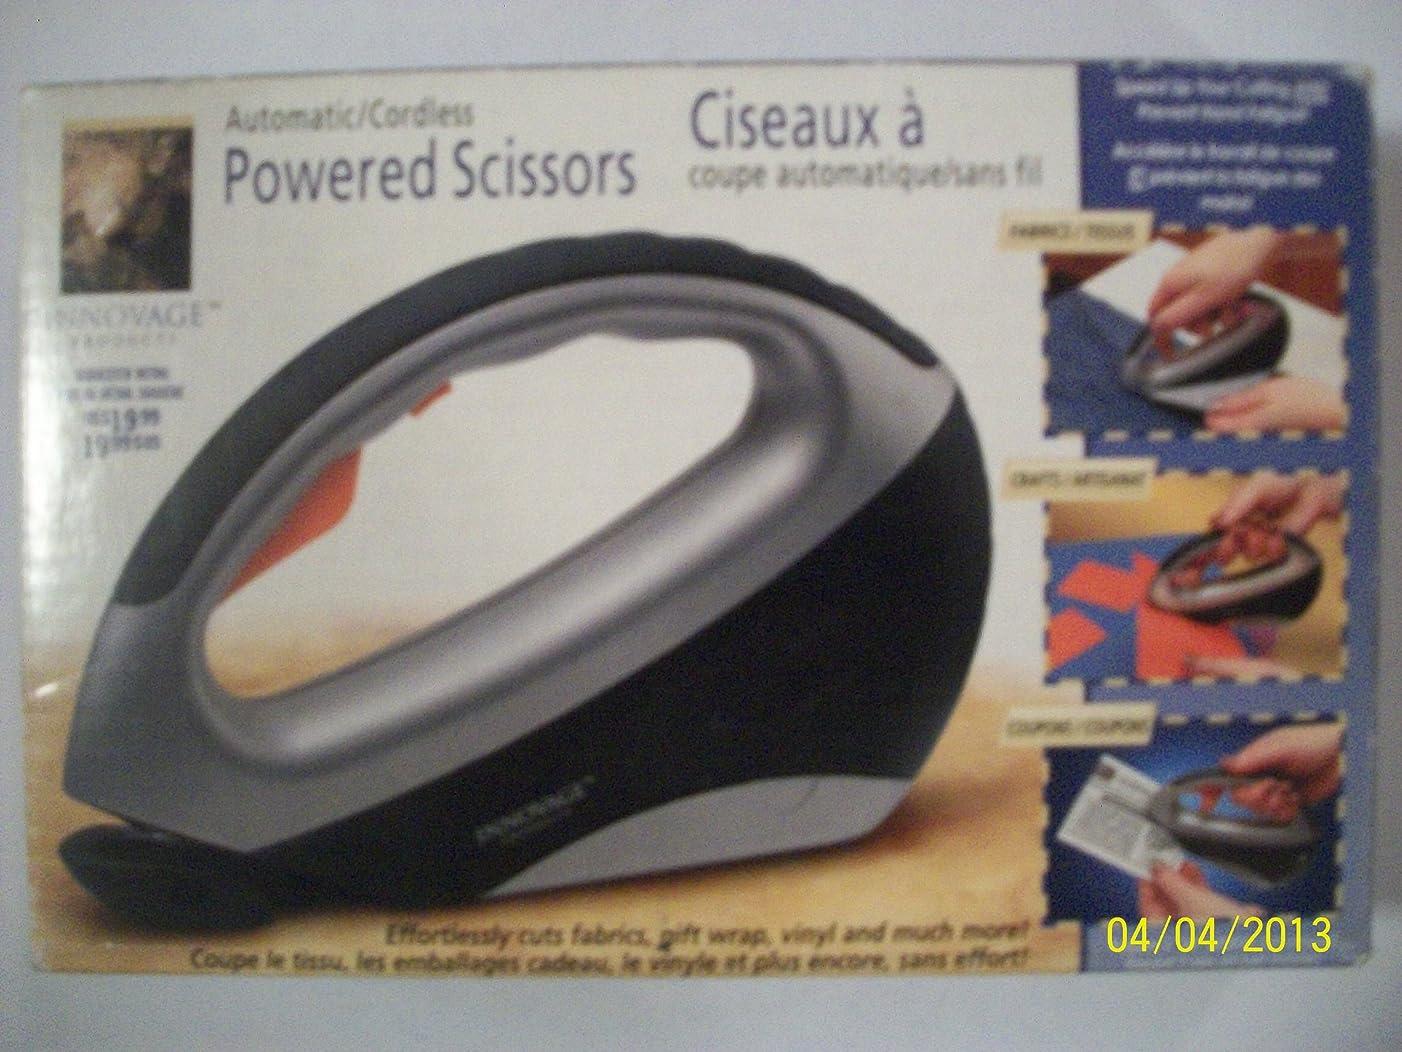 Powered Scissors